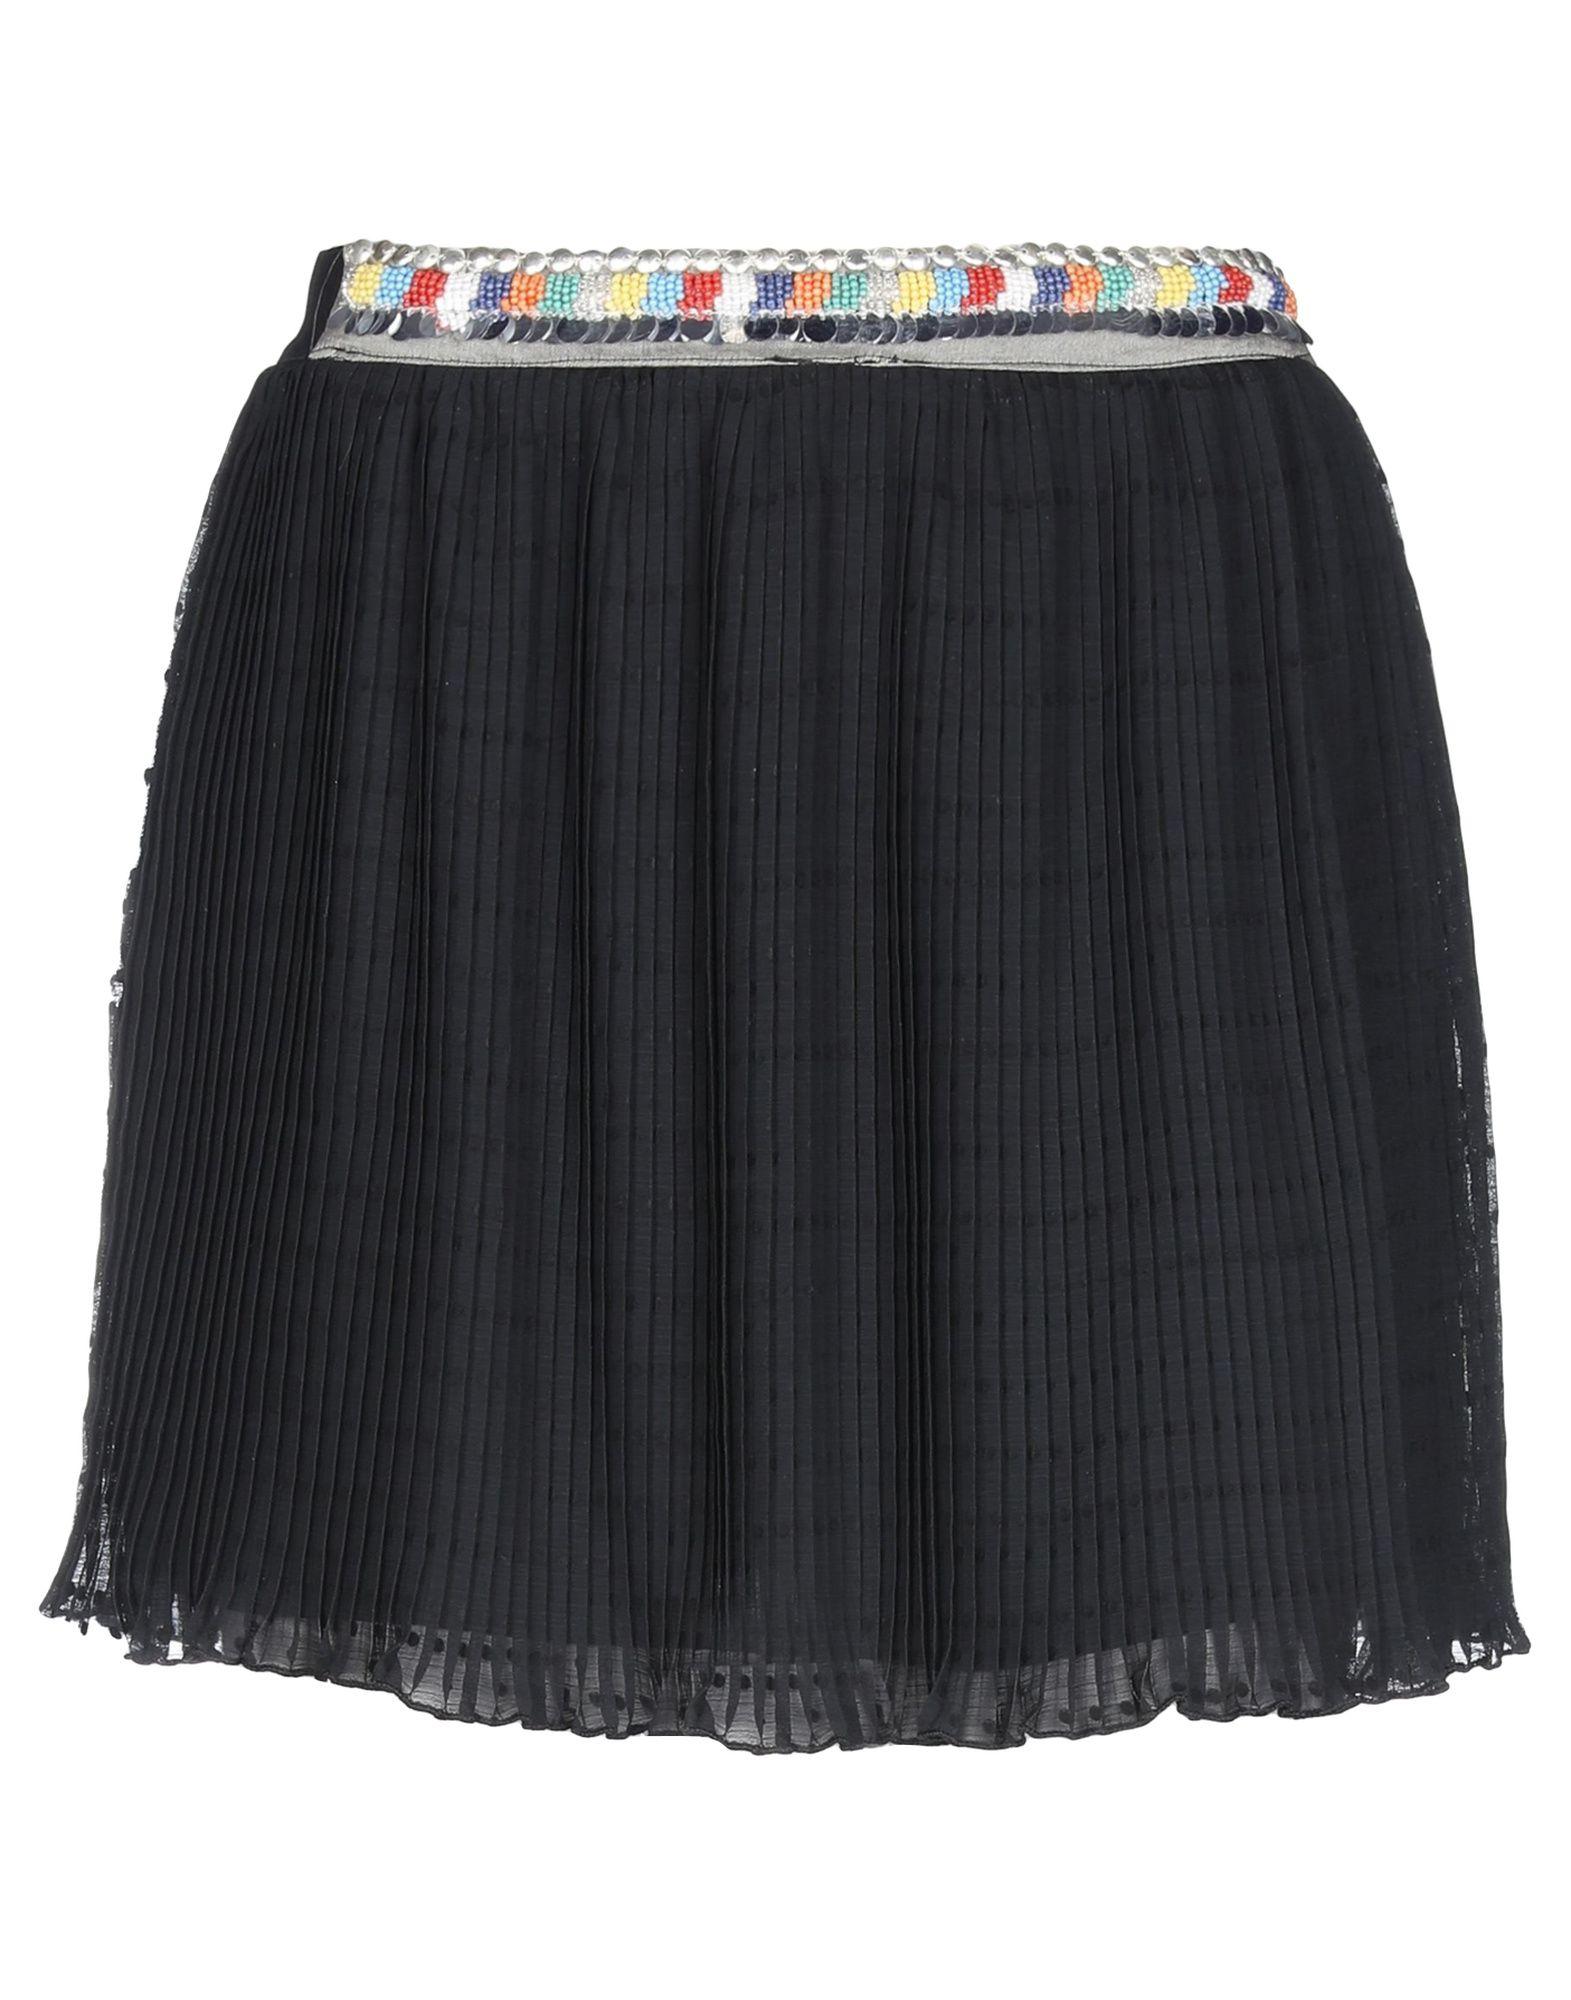 KATE BY LALTRAMODA Мини-юбка laltramoda юбка до колена